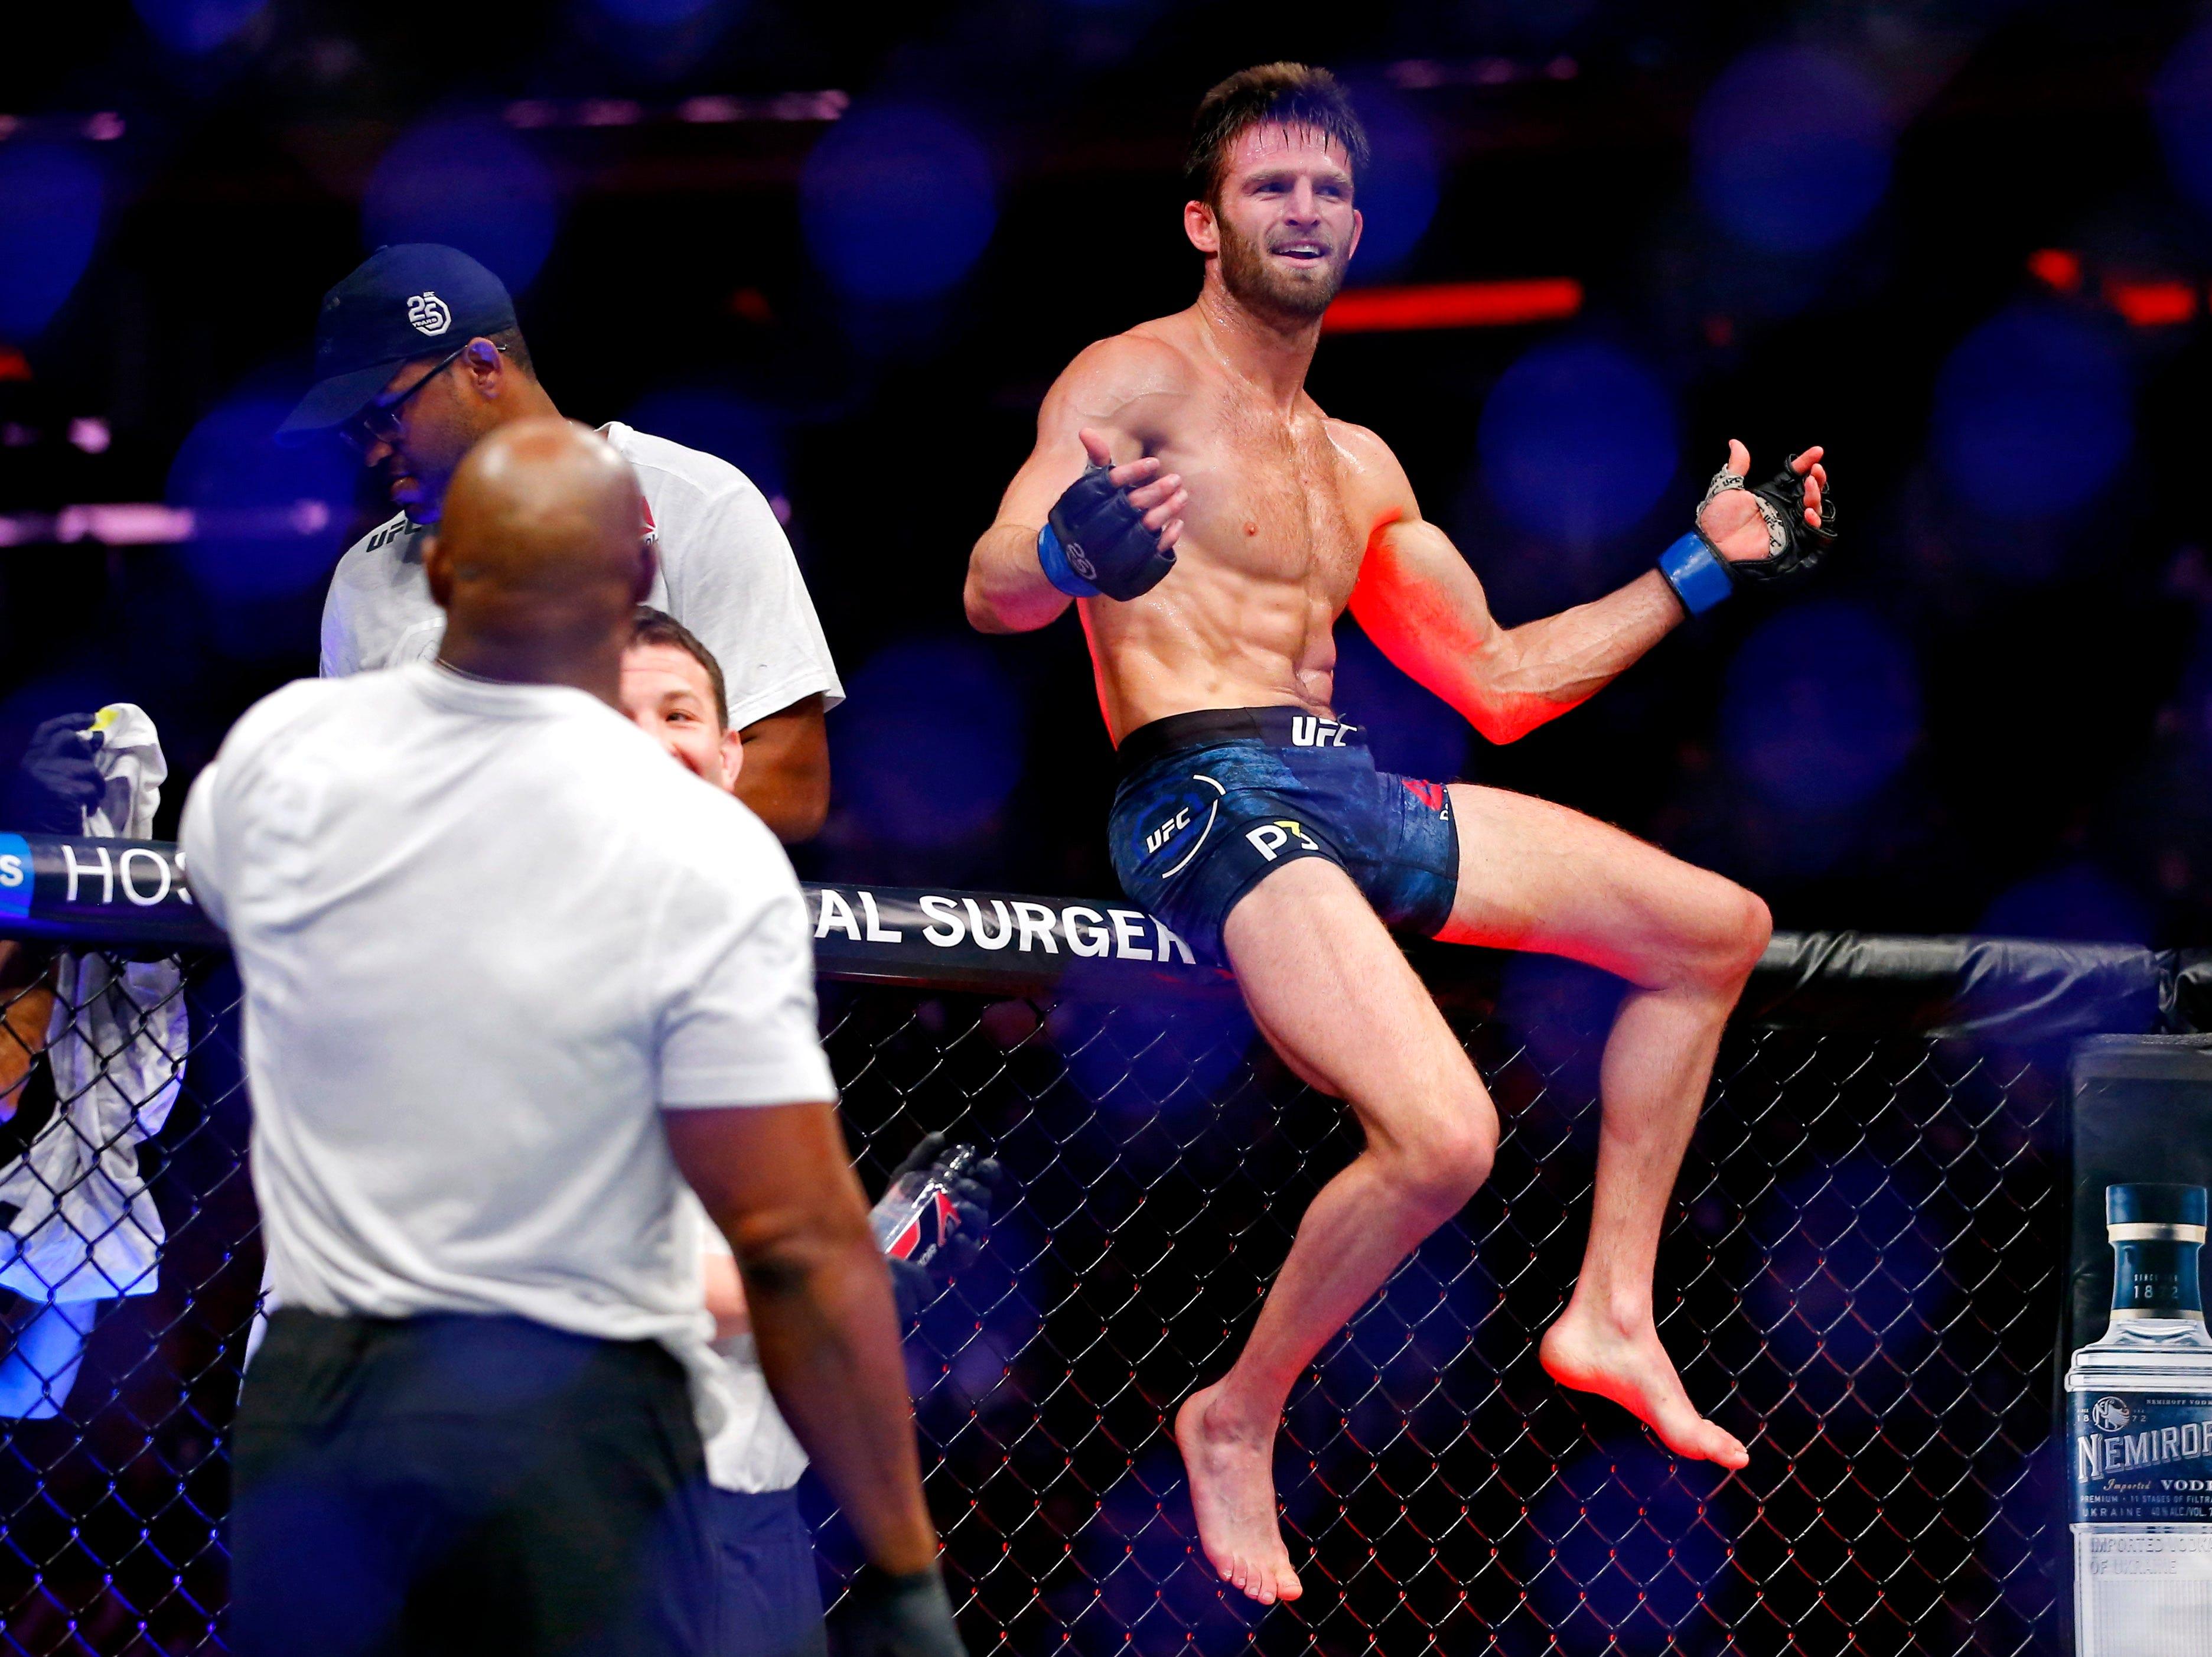 Jordan Rinaldi (blue gloves) celebrates beating Jason Knight (red gloves) during UFC 230 at Madison Square Garden.